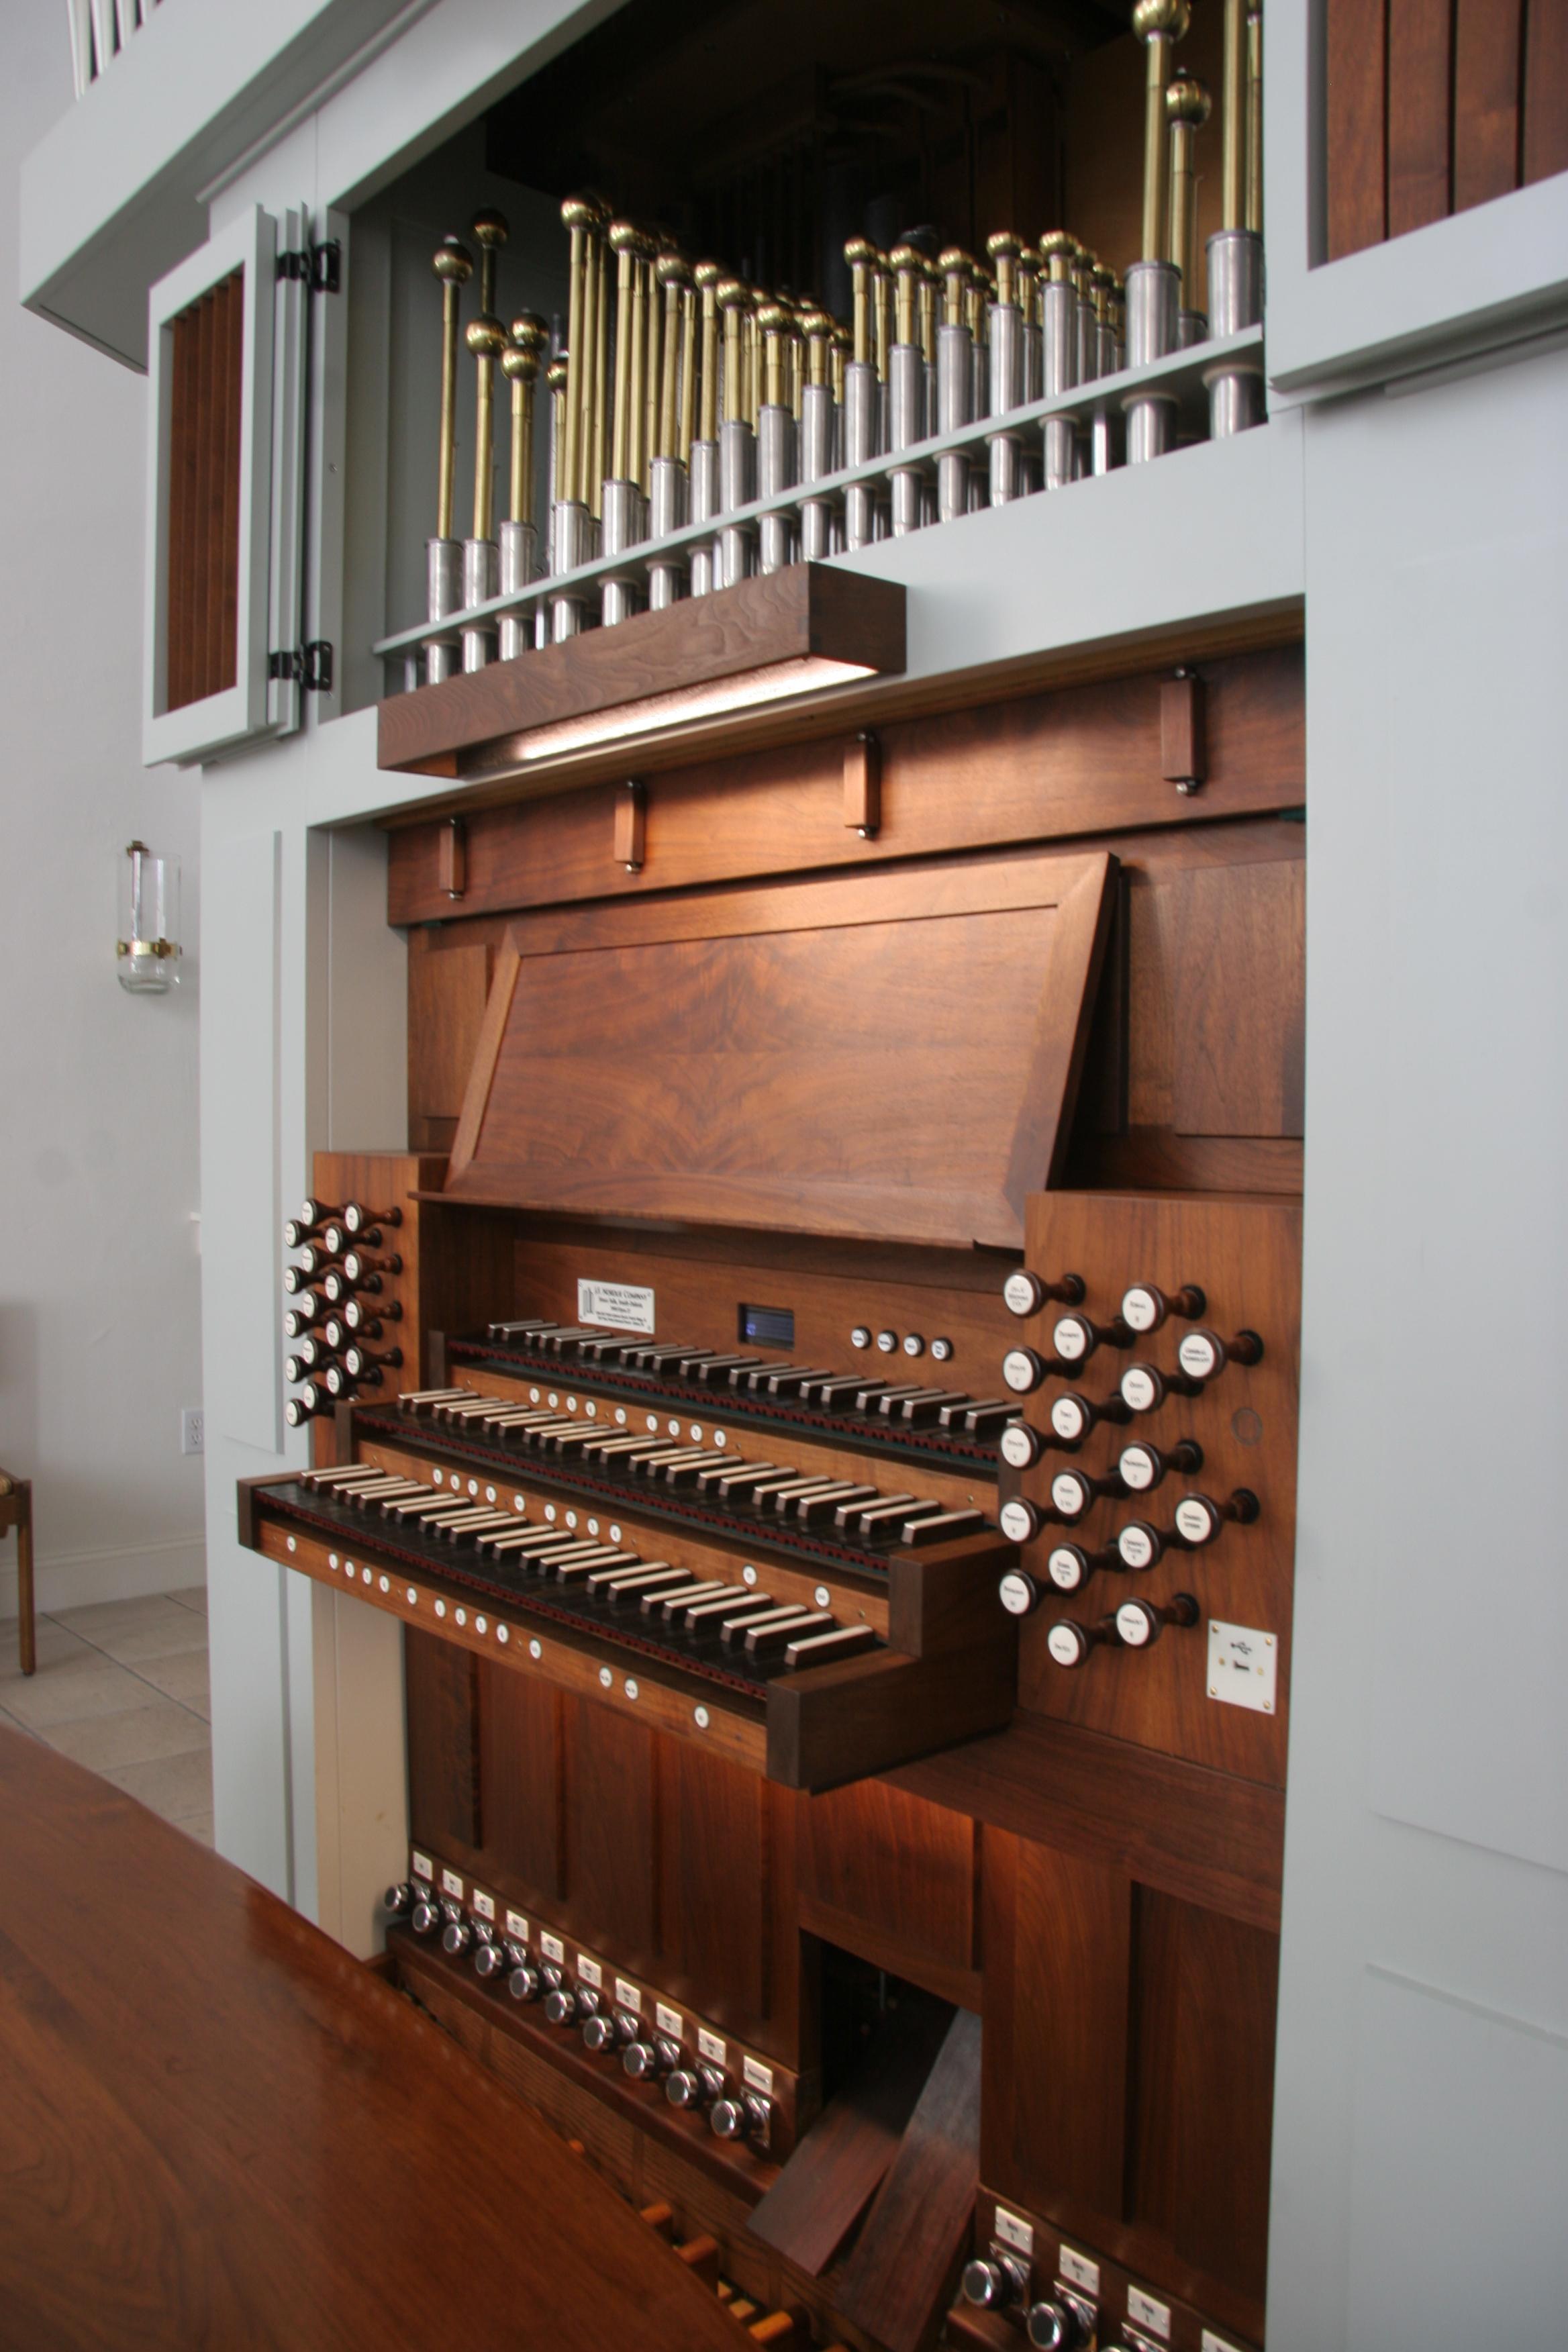 Opus 27, Oxford Ohio